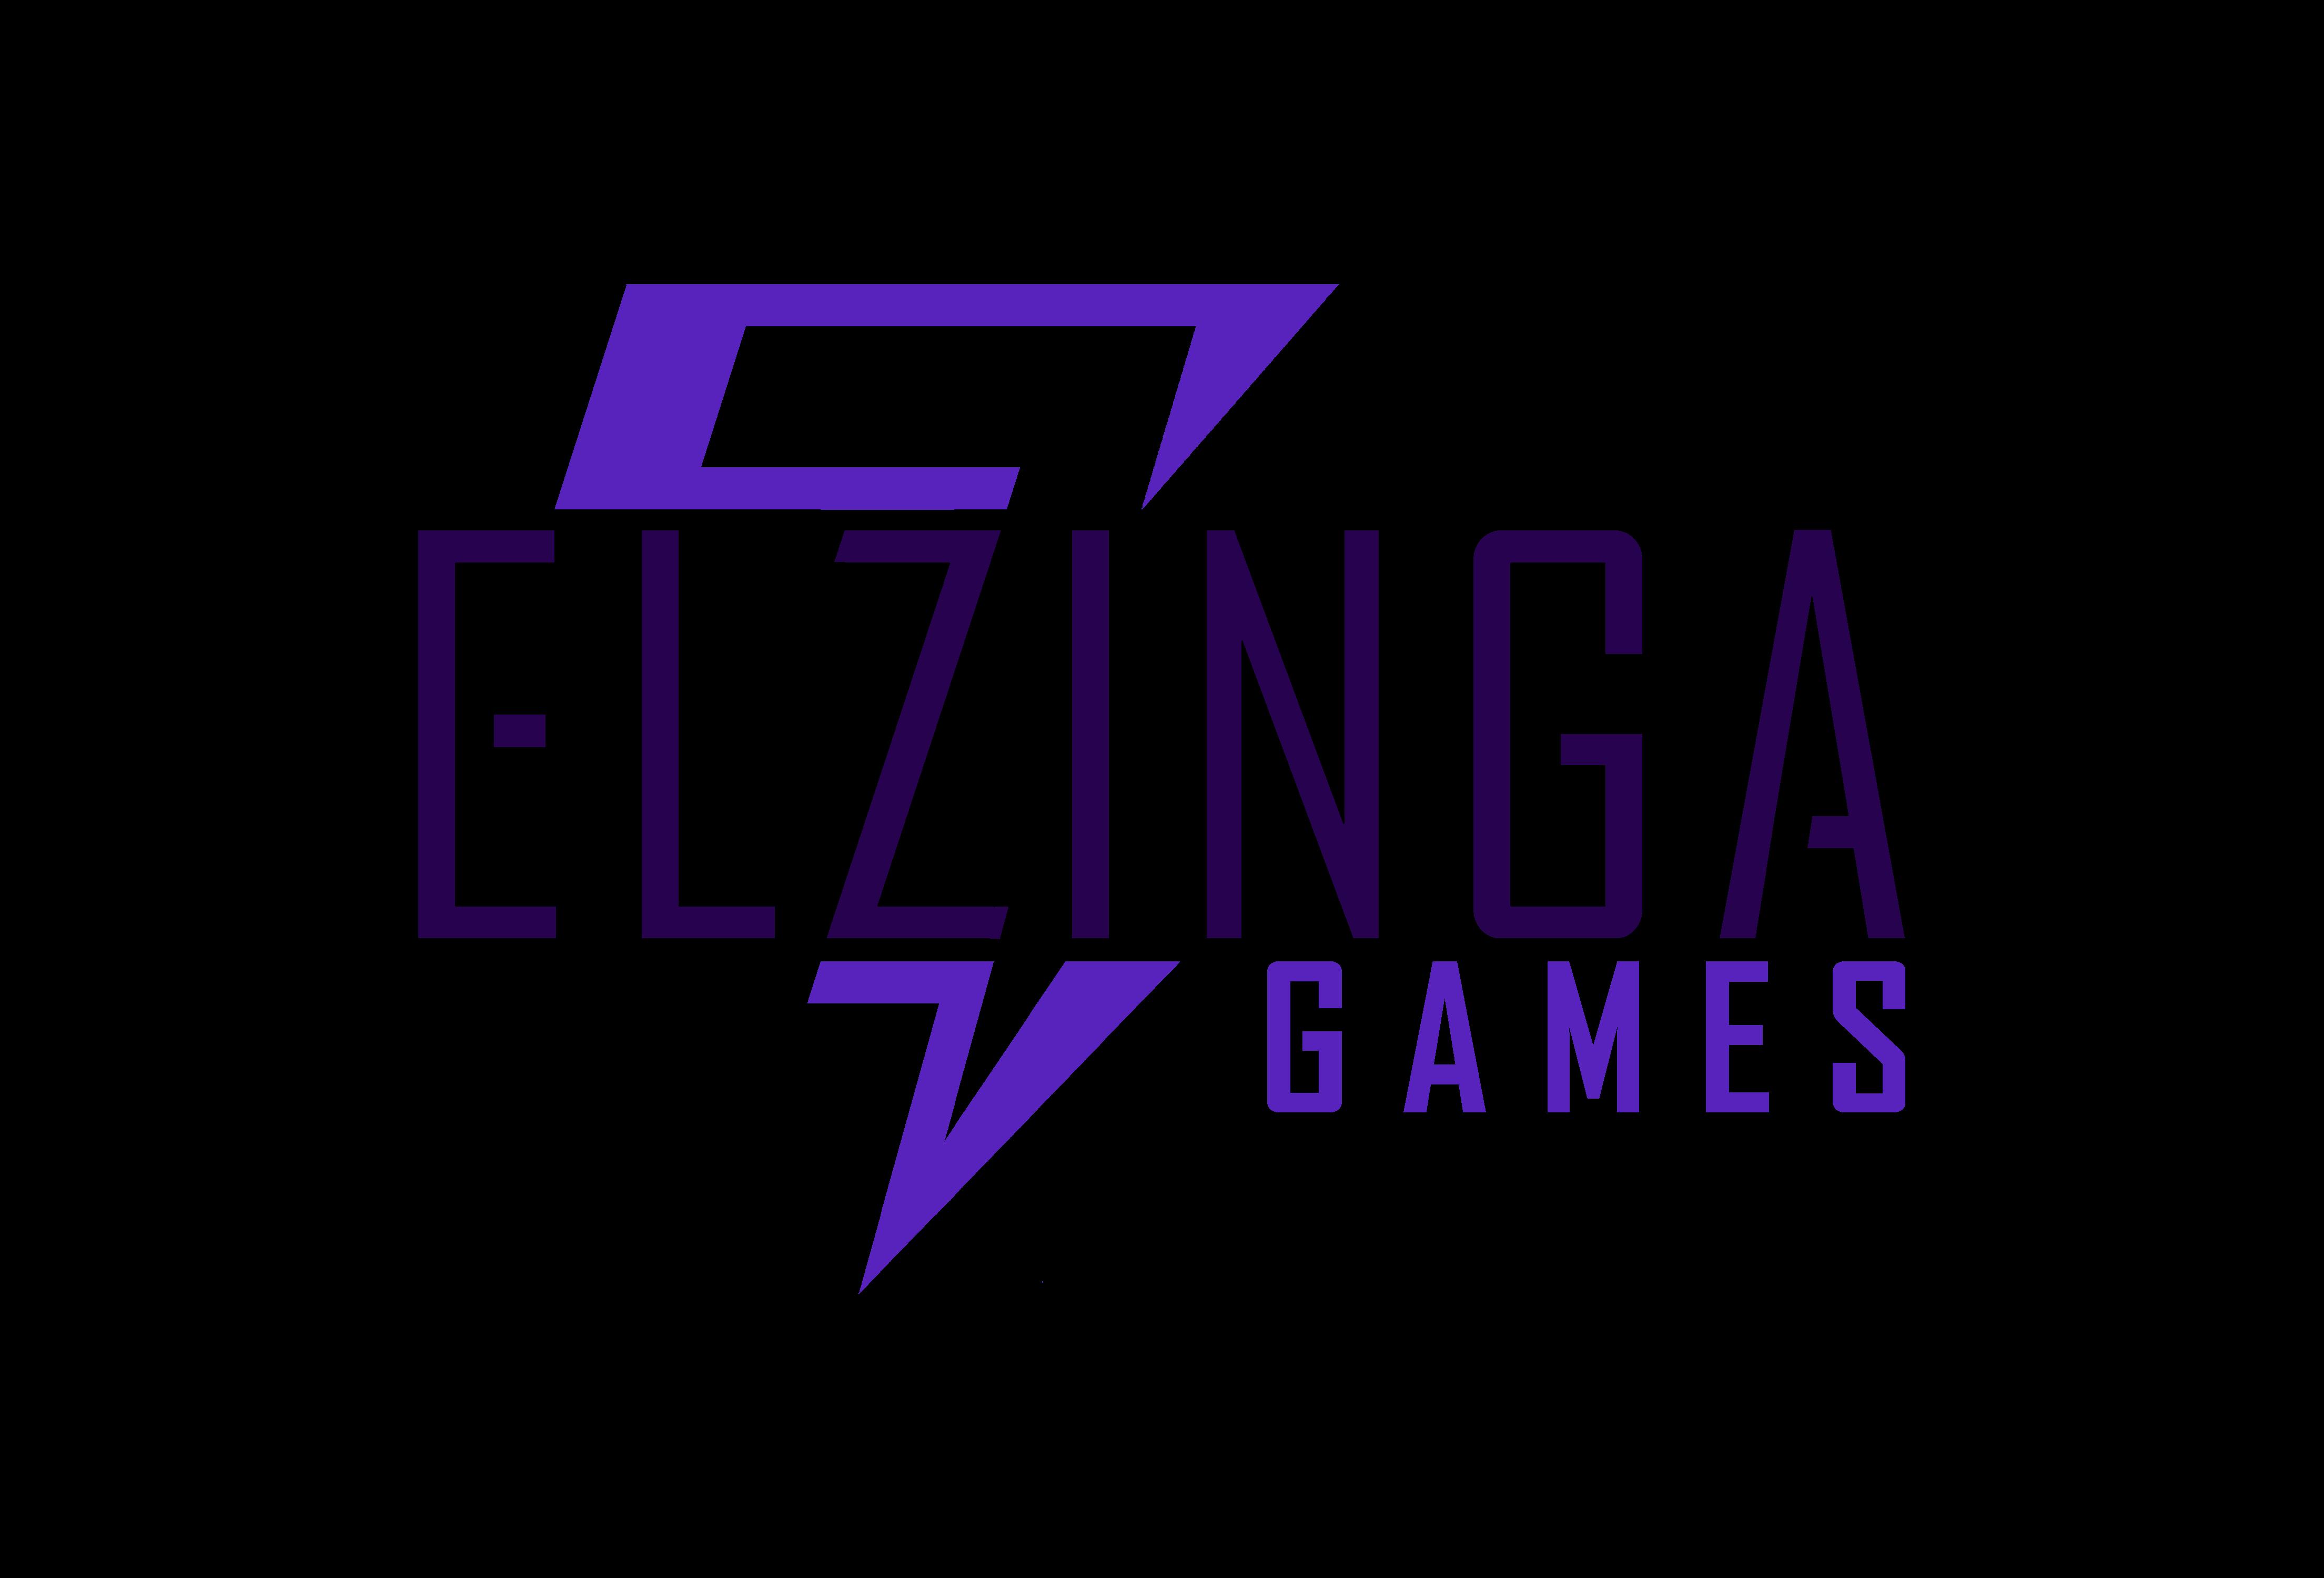 Elzinga Games